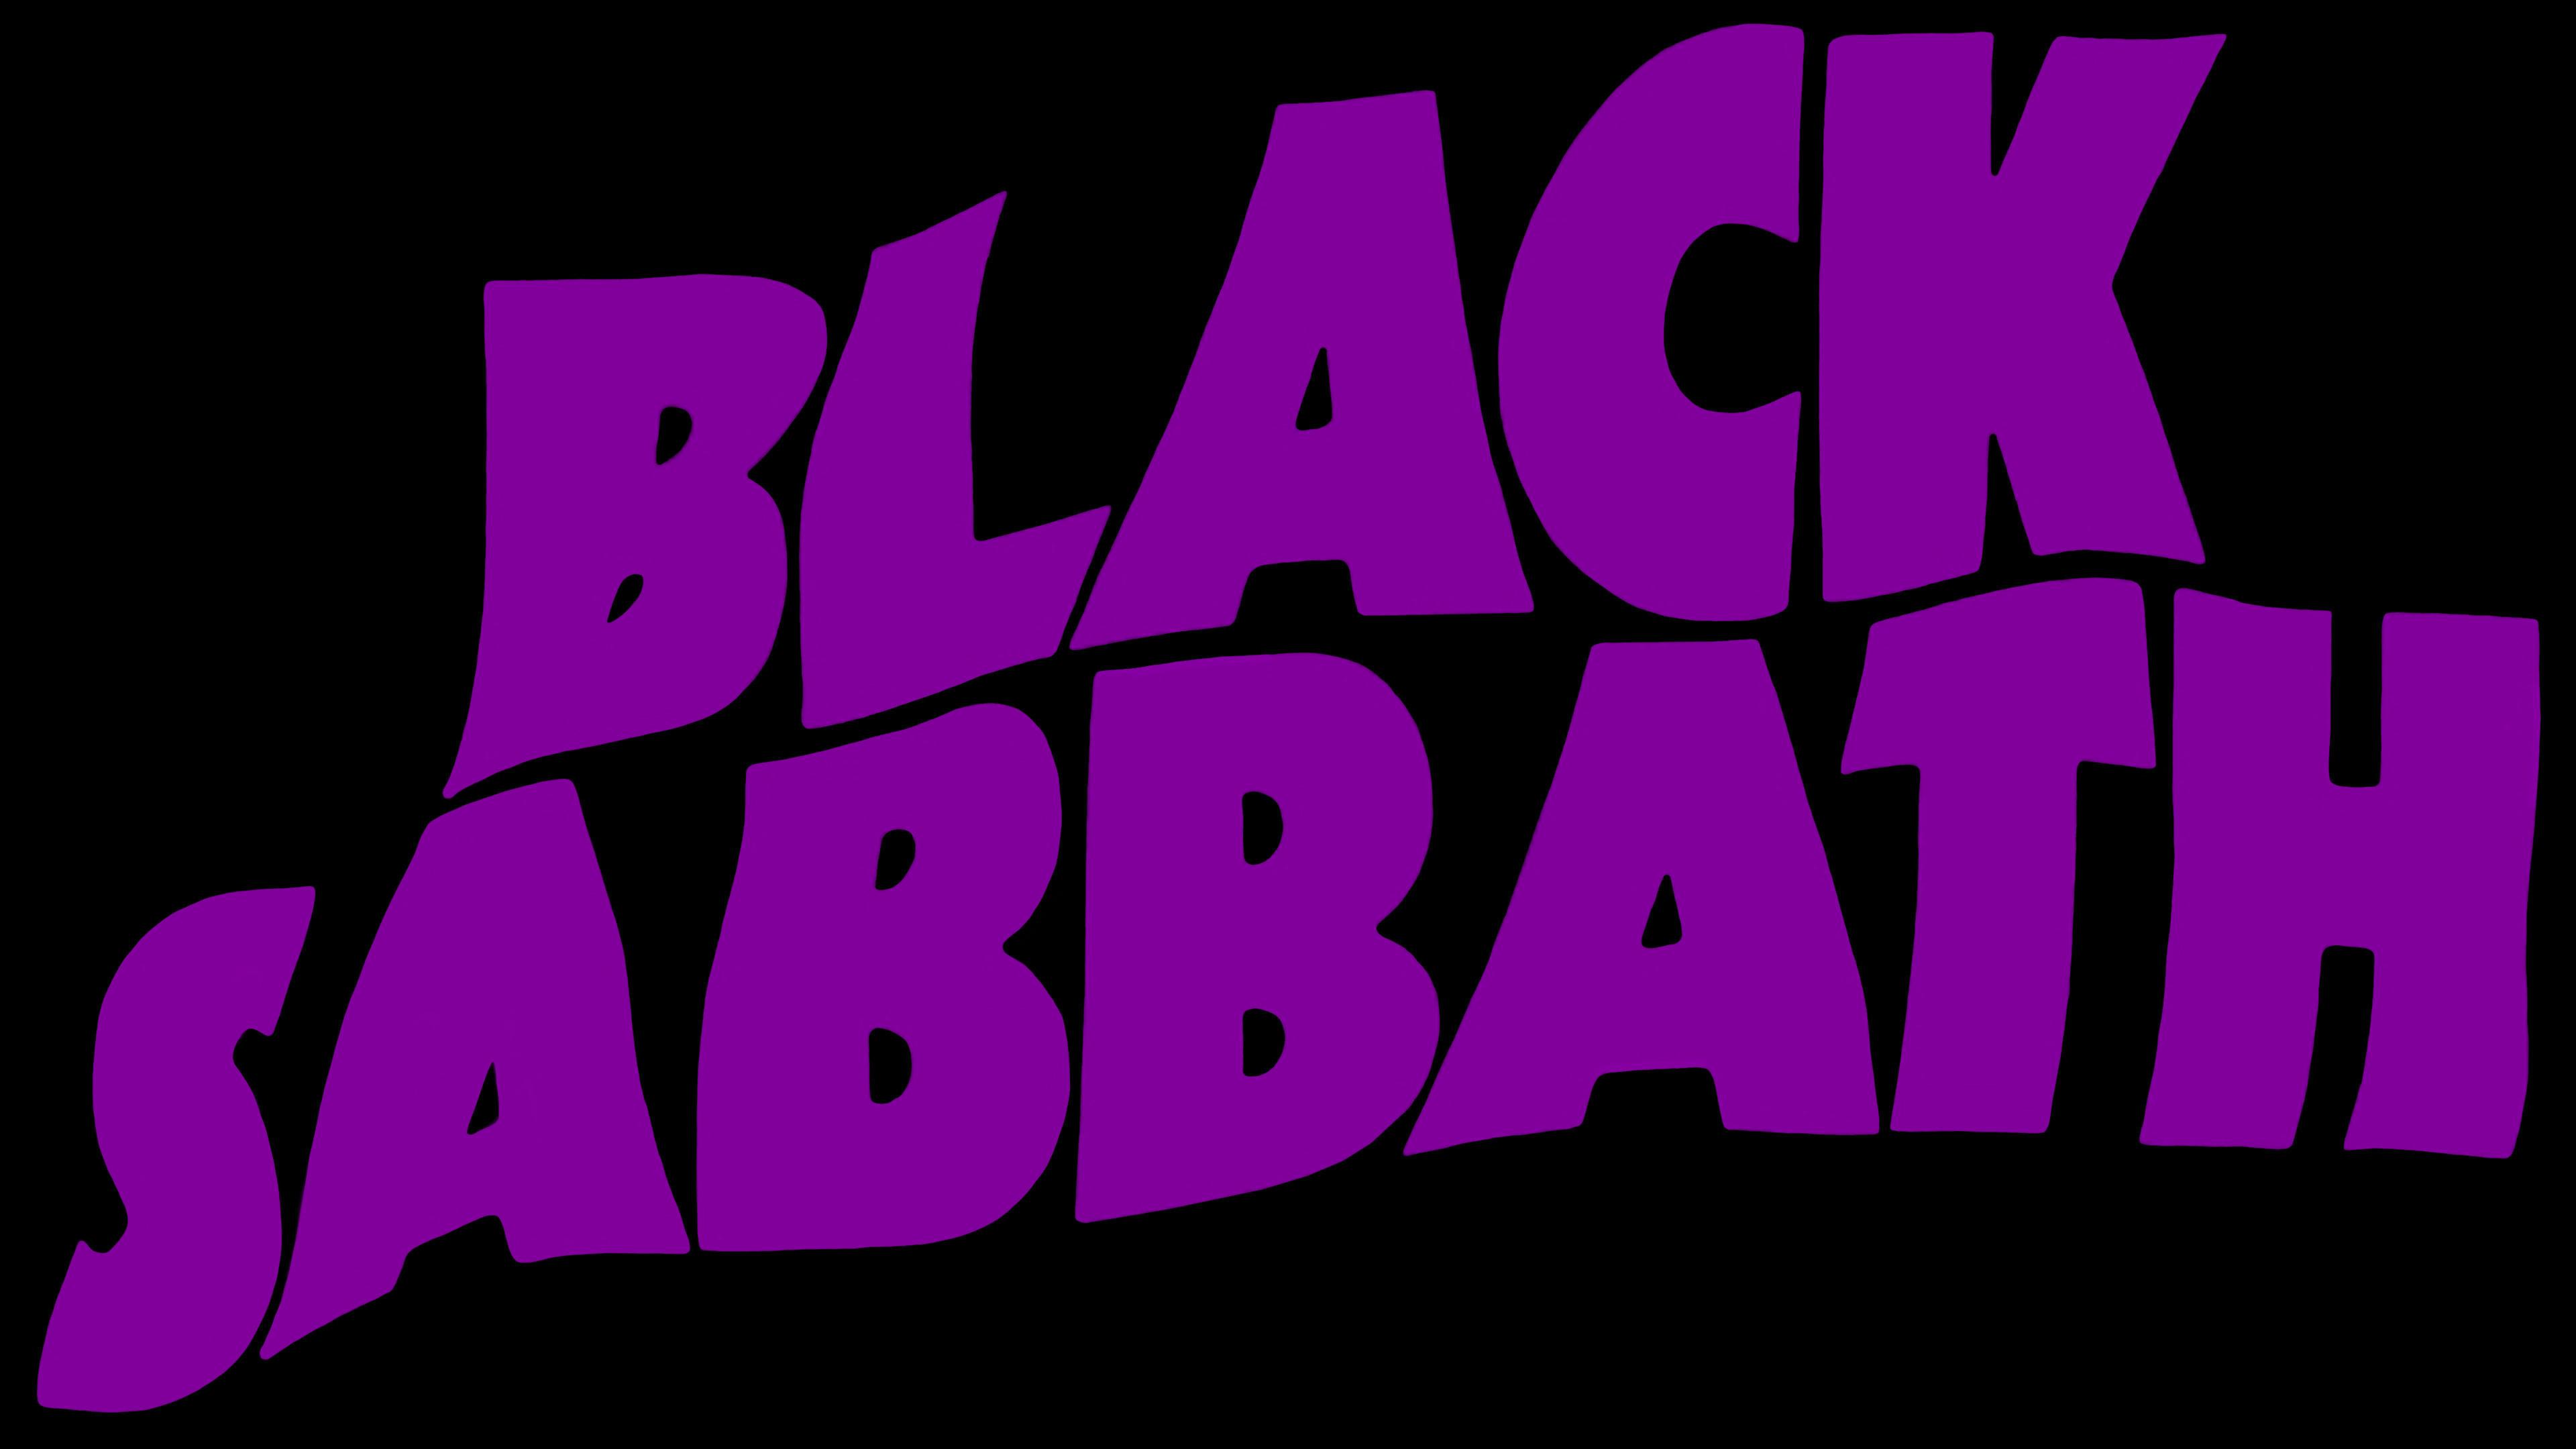 Music – Black Sabbath Heavy Metal Wallpaper